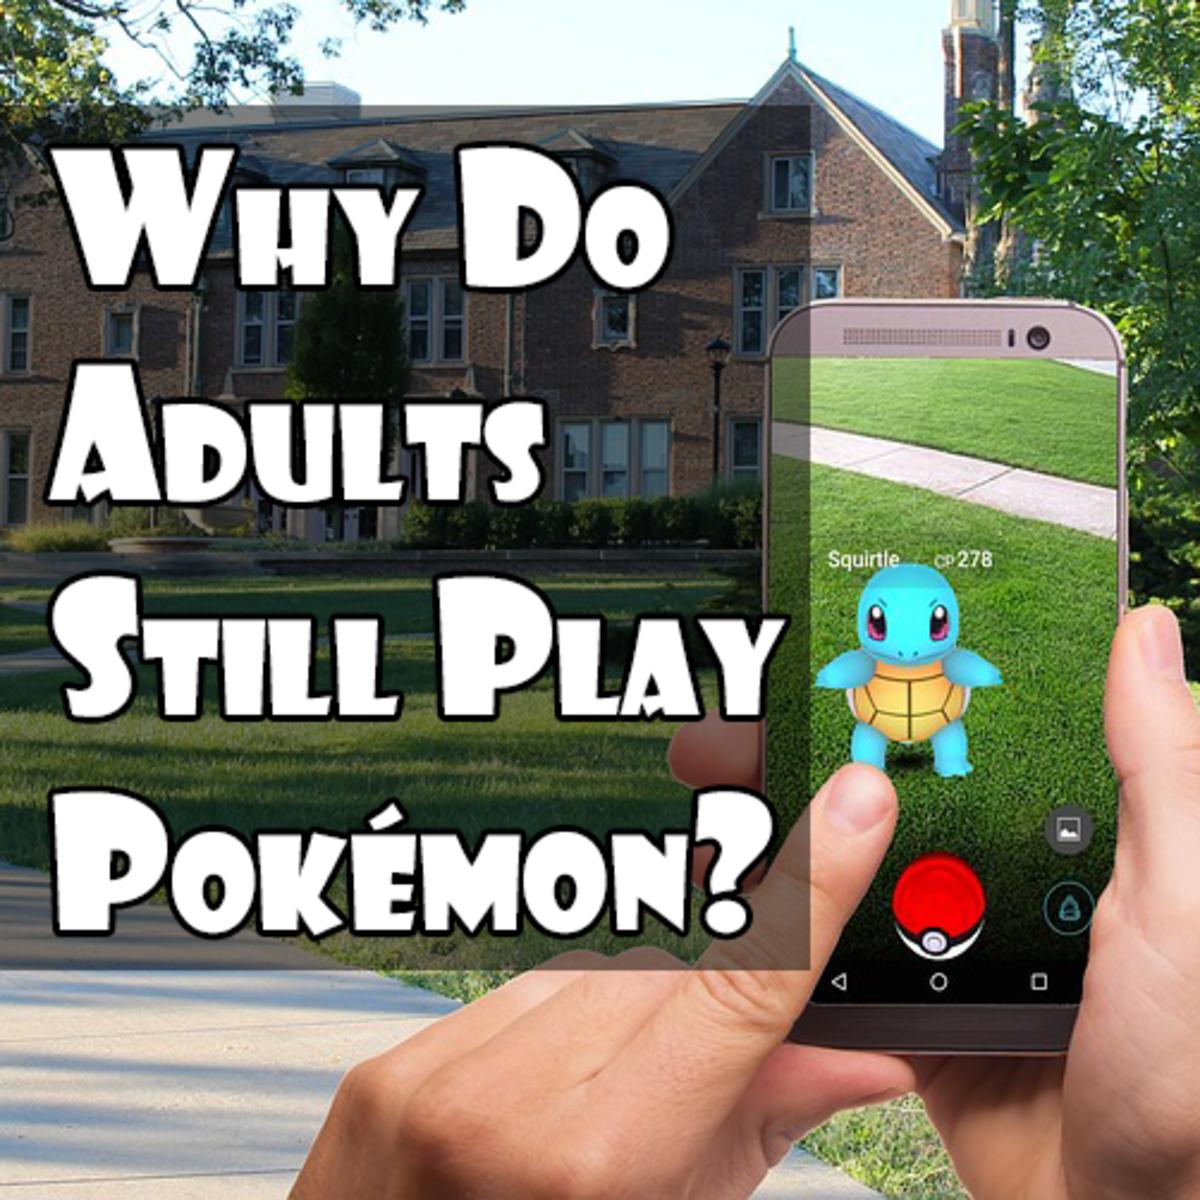 Why Do Adults Still Play Pokémon?